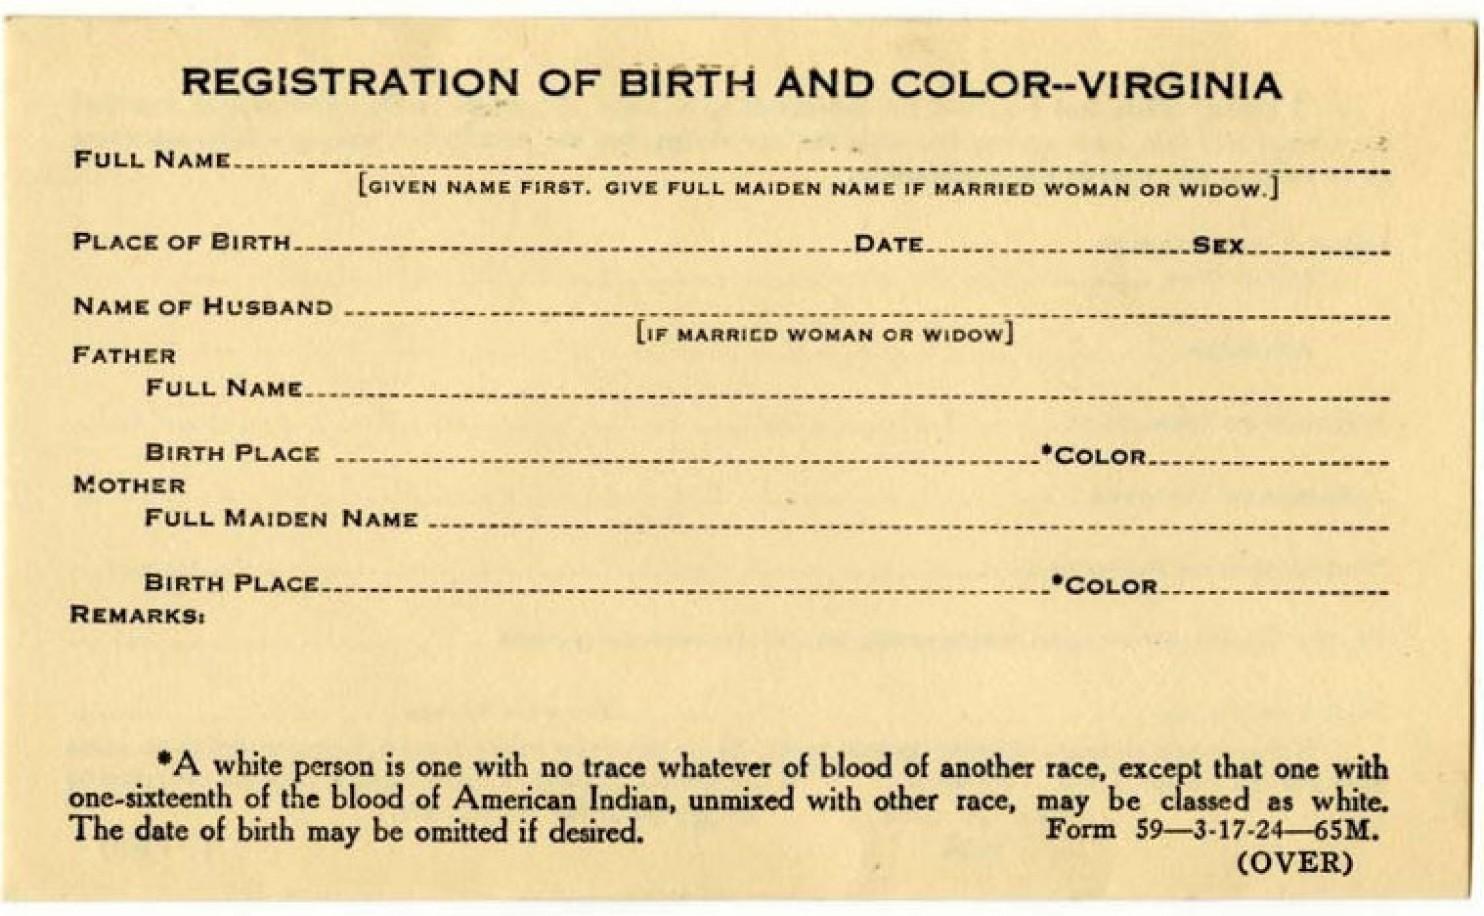 birthcertificate.jpg